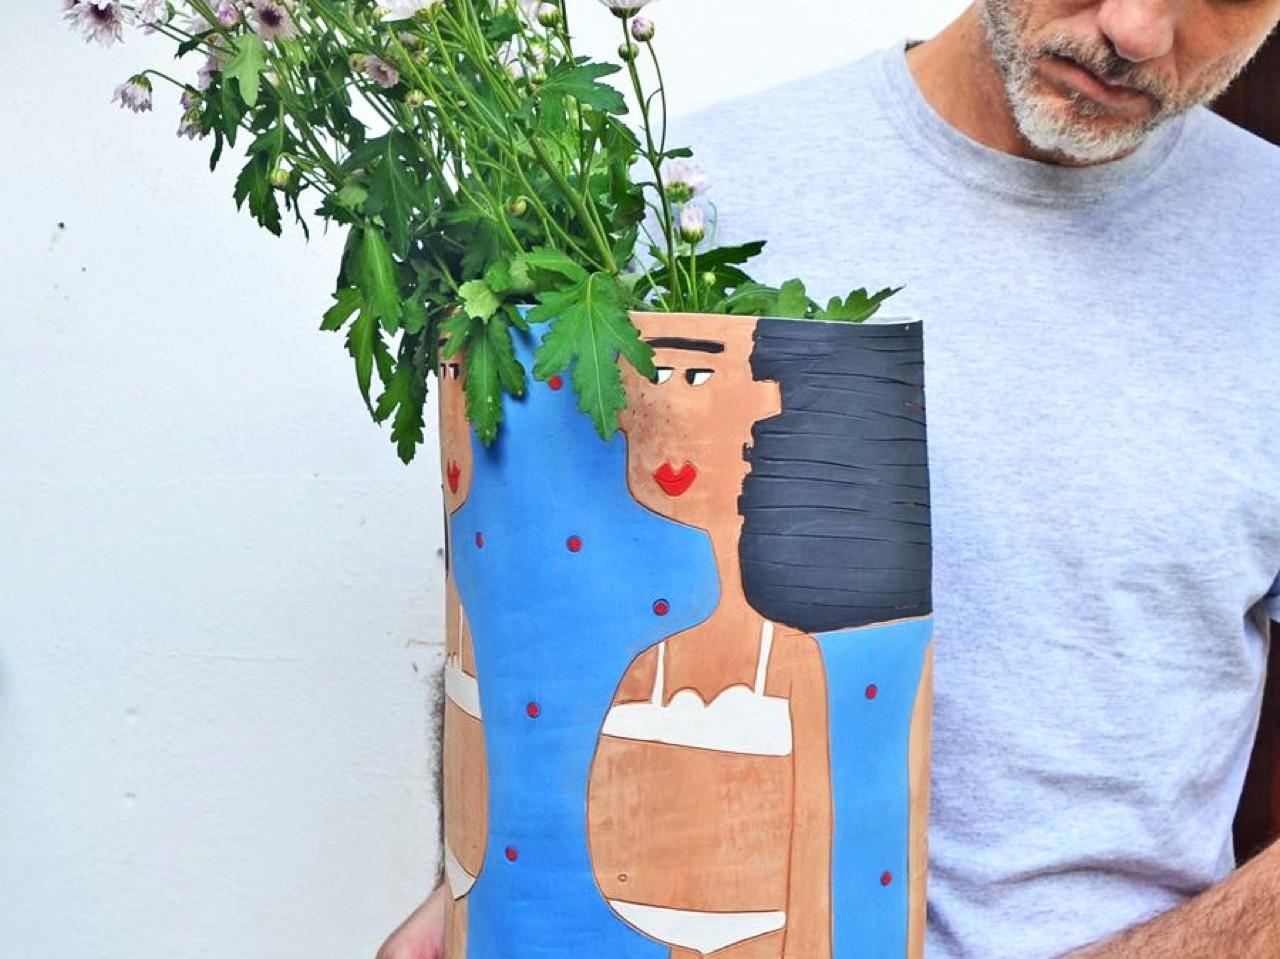 Ceramic Workshops Pottery Village Margarites Rethimno Crete, Individual Short Hand Building, Wheel Throwing Session margarites, Children Program - PlayCLAY, Pottery Lab, Wheel Throwing Course, Basic Decorating Techniques ceramic, activities rethimno rethymno